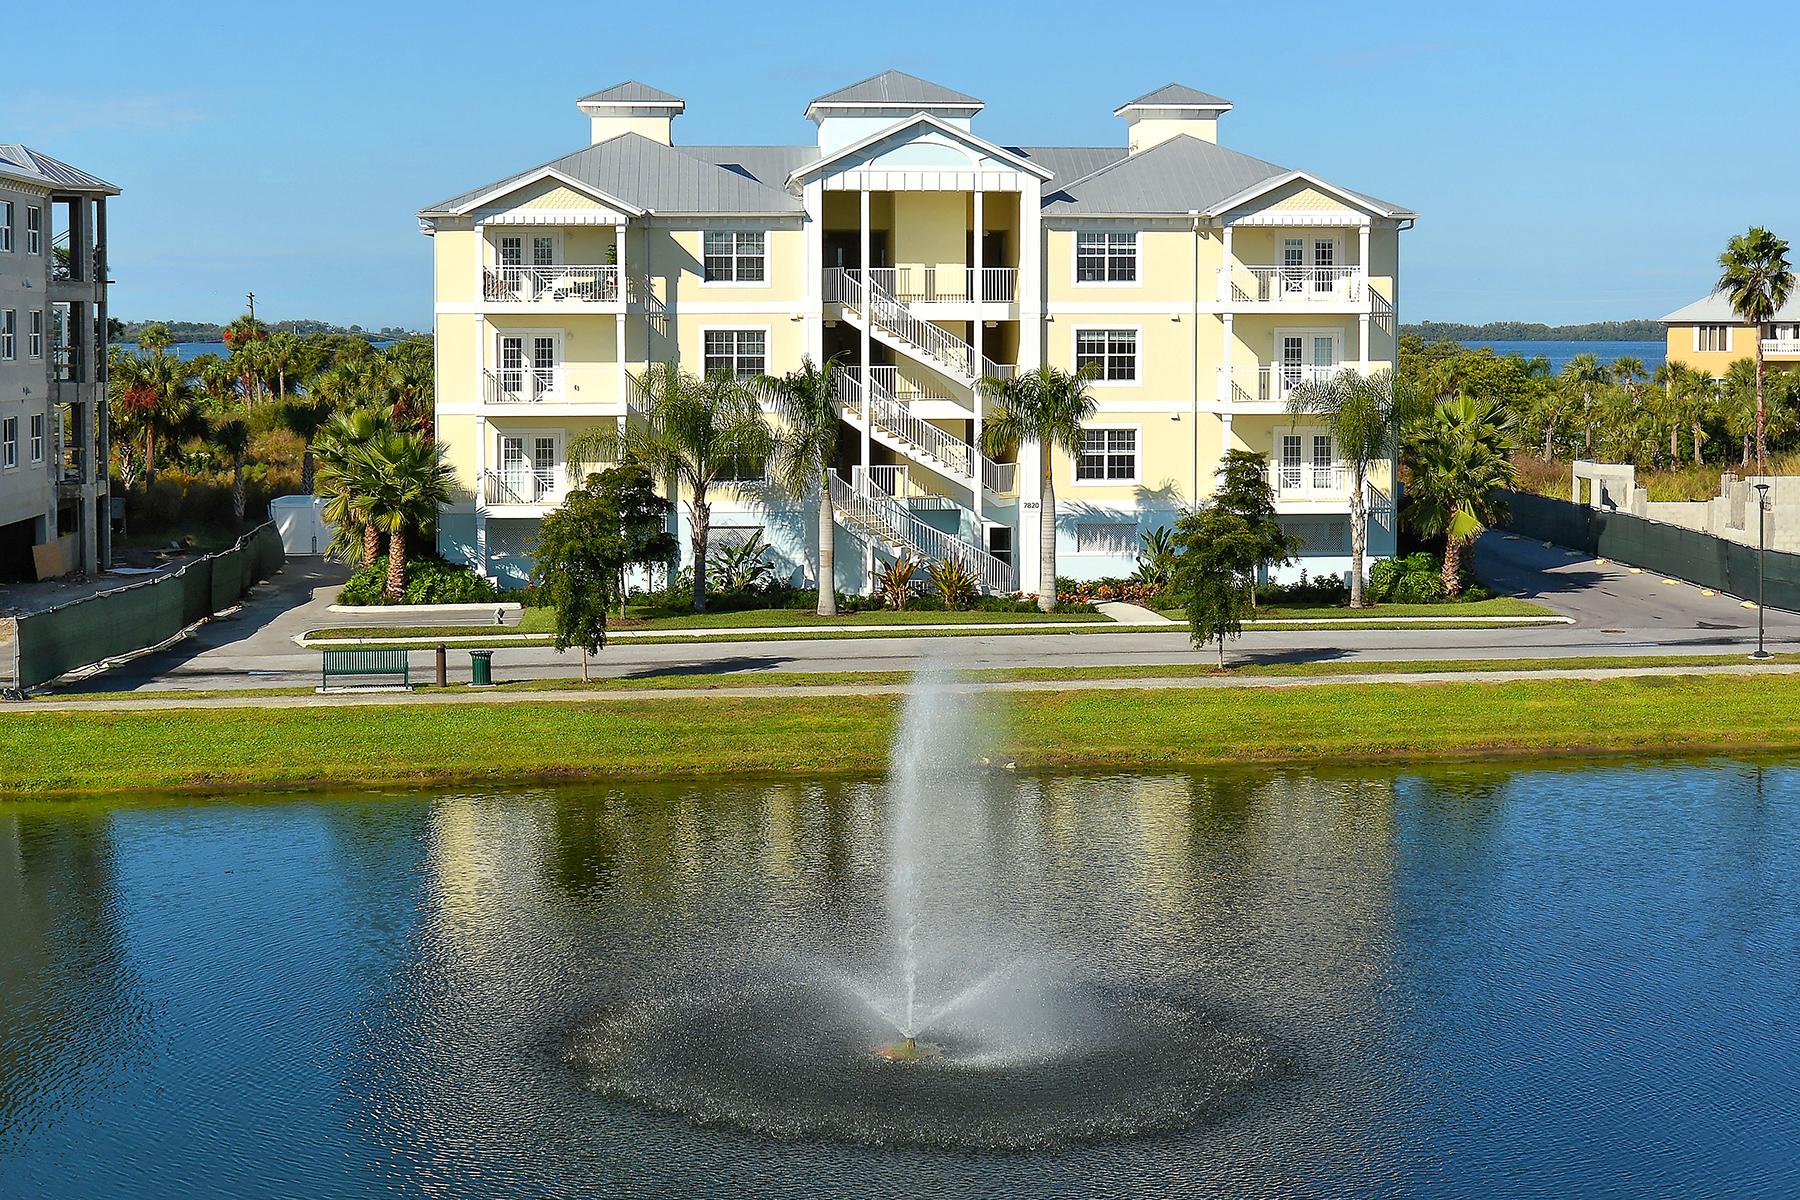 Condominium for Sale at PALMA SOLA BAY CLUB 7810 34th Ave W 202 Bradenton, Florida 34209 United States